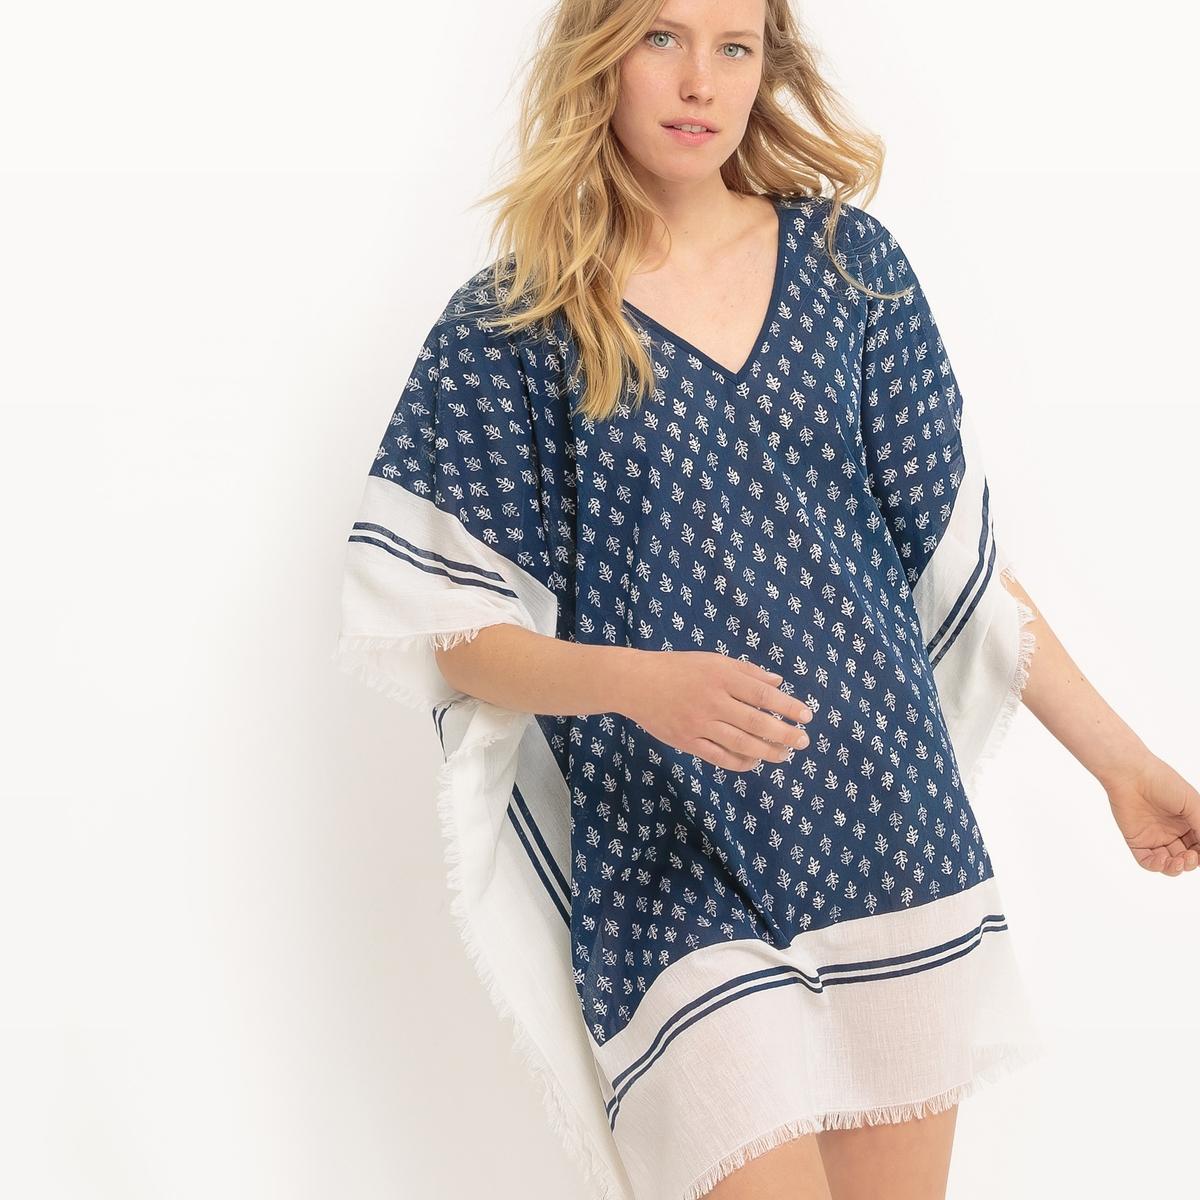 Блузка с принтом от La Redoute